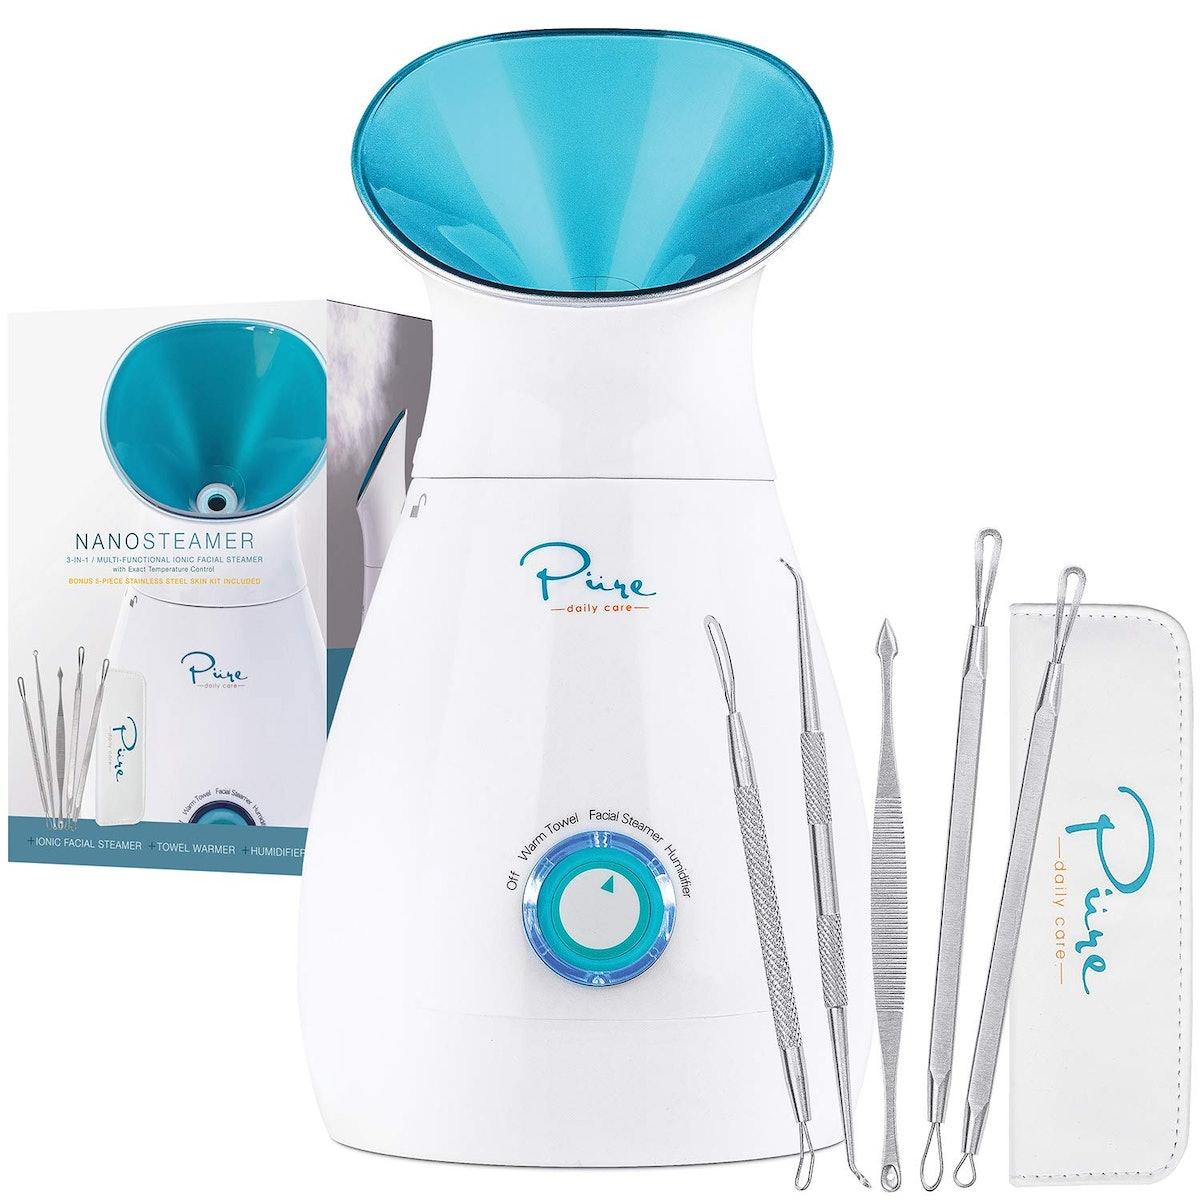 Pure Daily Care NanoSteamer